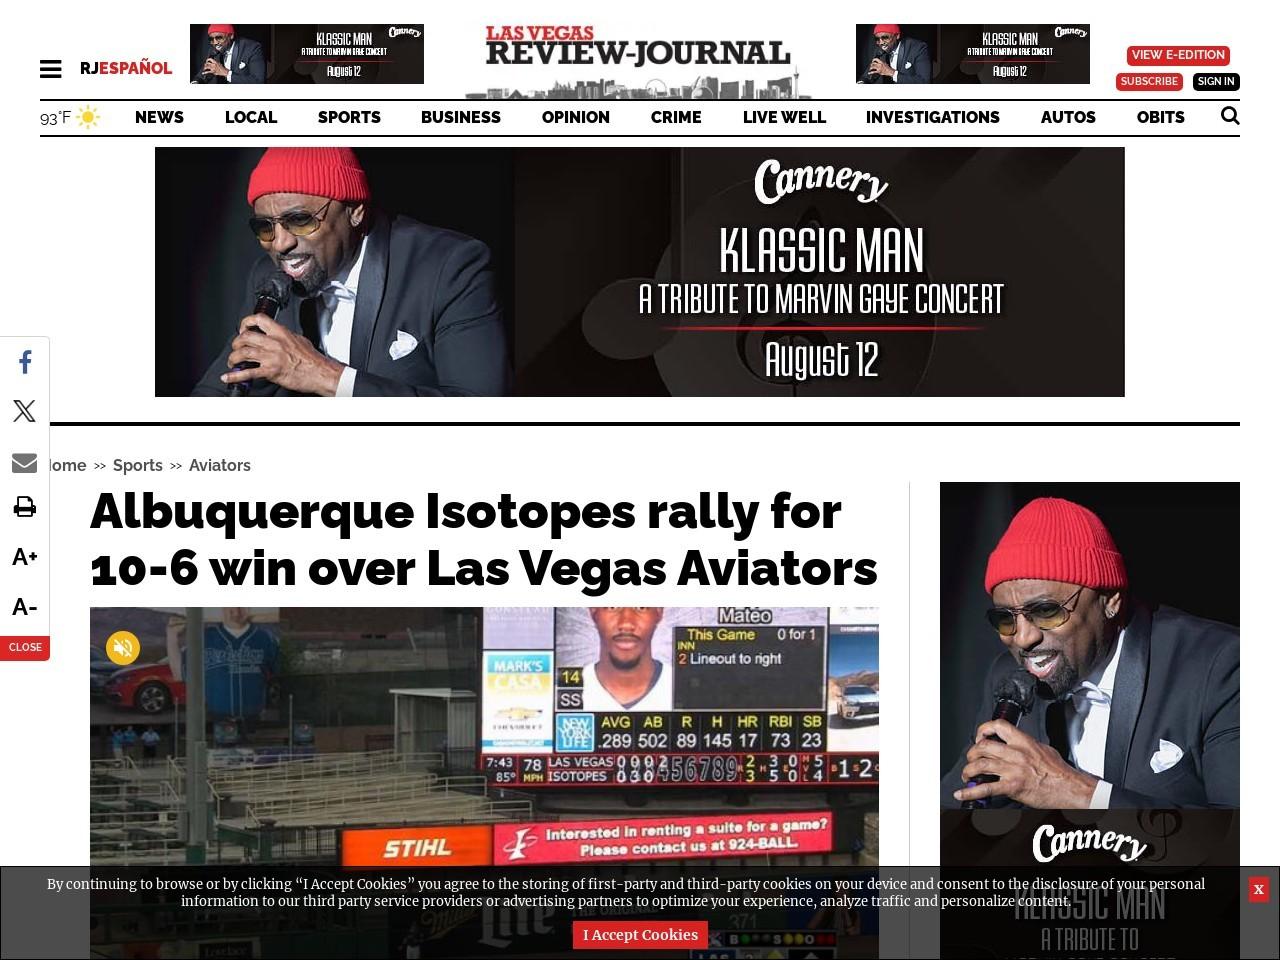 Albuquerque Isotopes rally for 10-6 win over Las Vegas Aviators